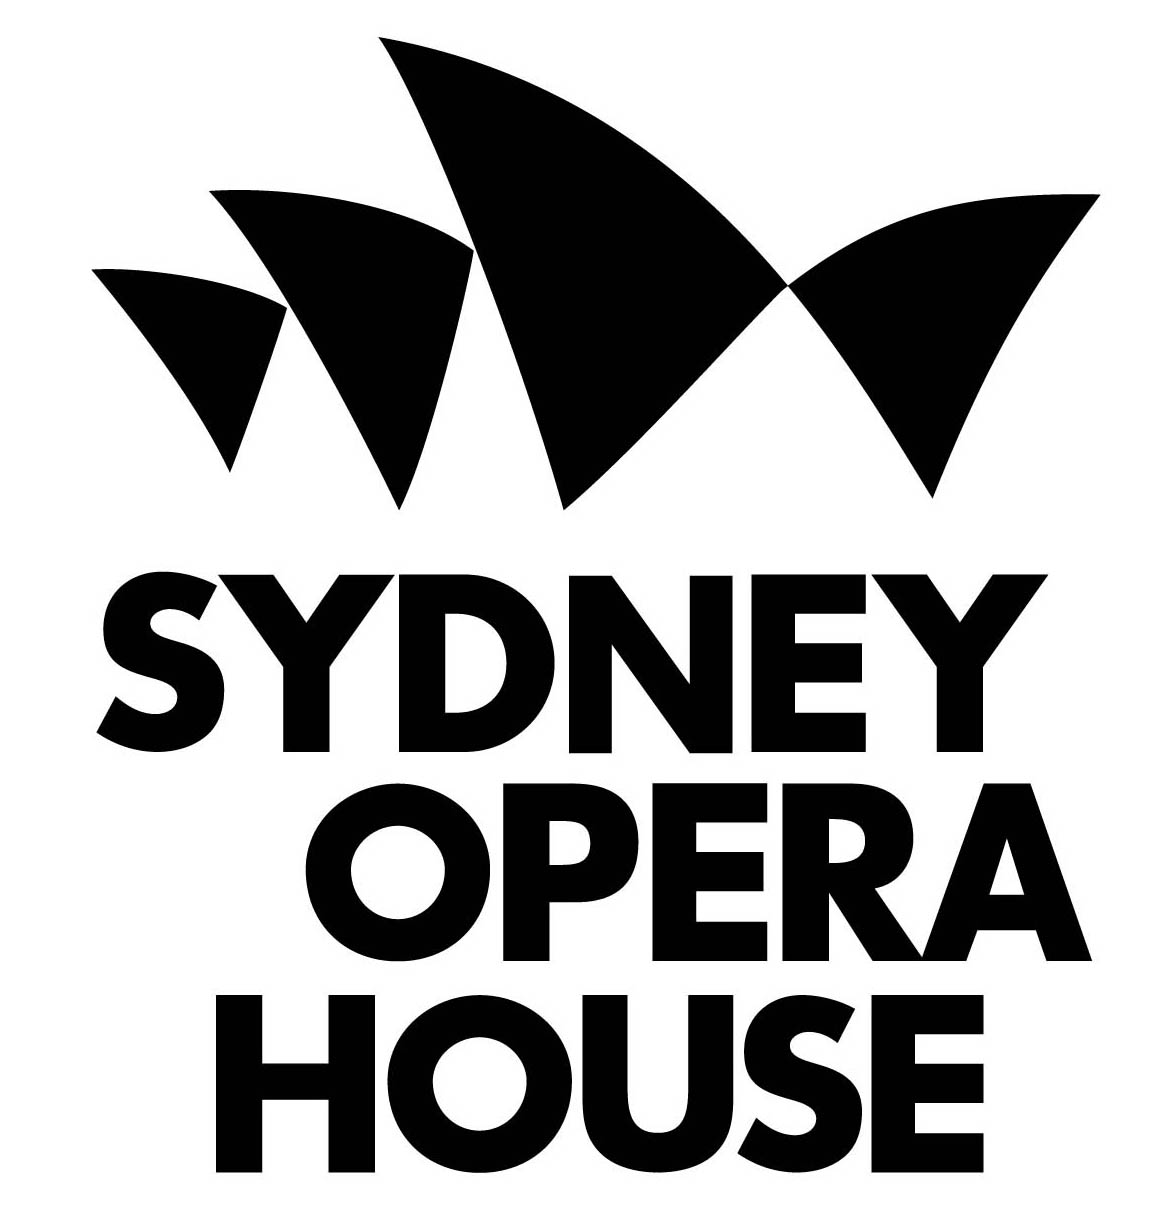 Sydney-Opera-Hosue.jpg